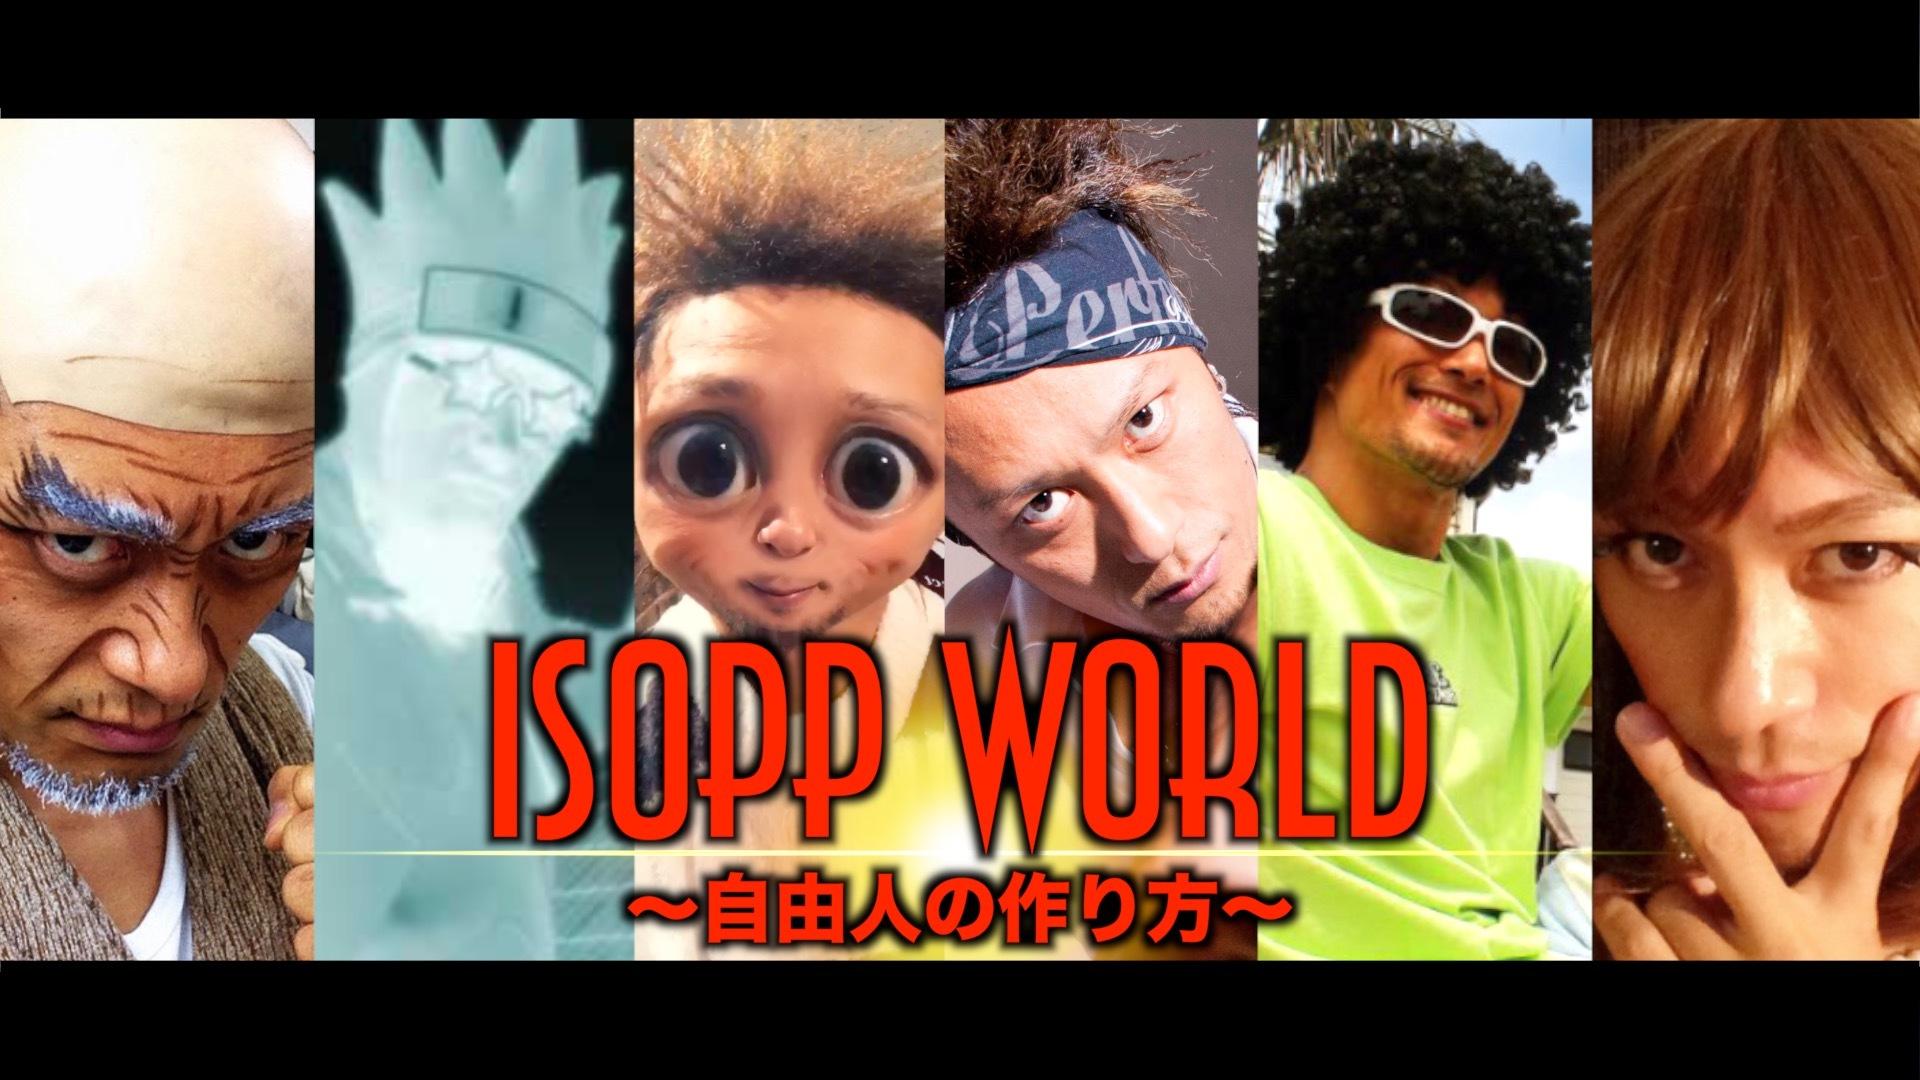 ISOPP WORLD 〜自由人の作り方〜